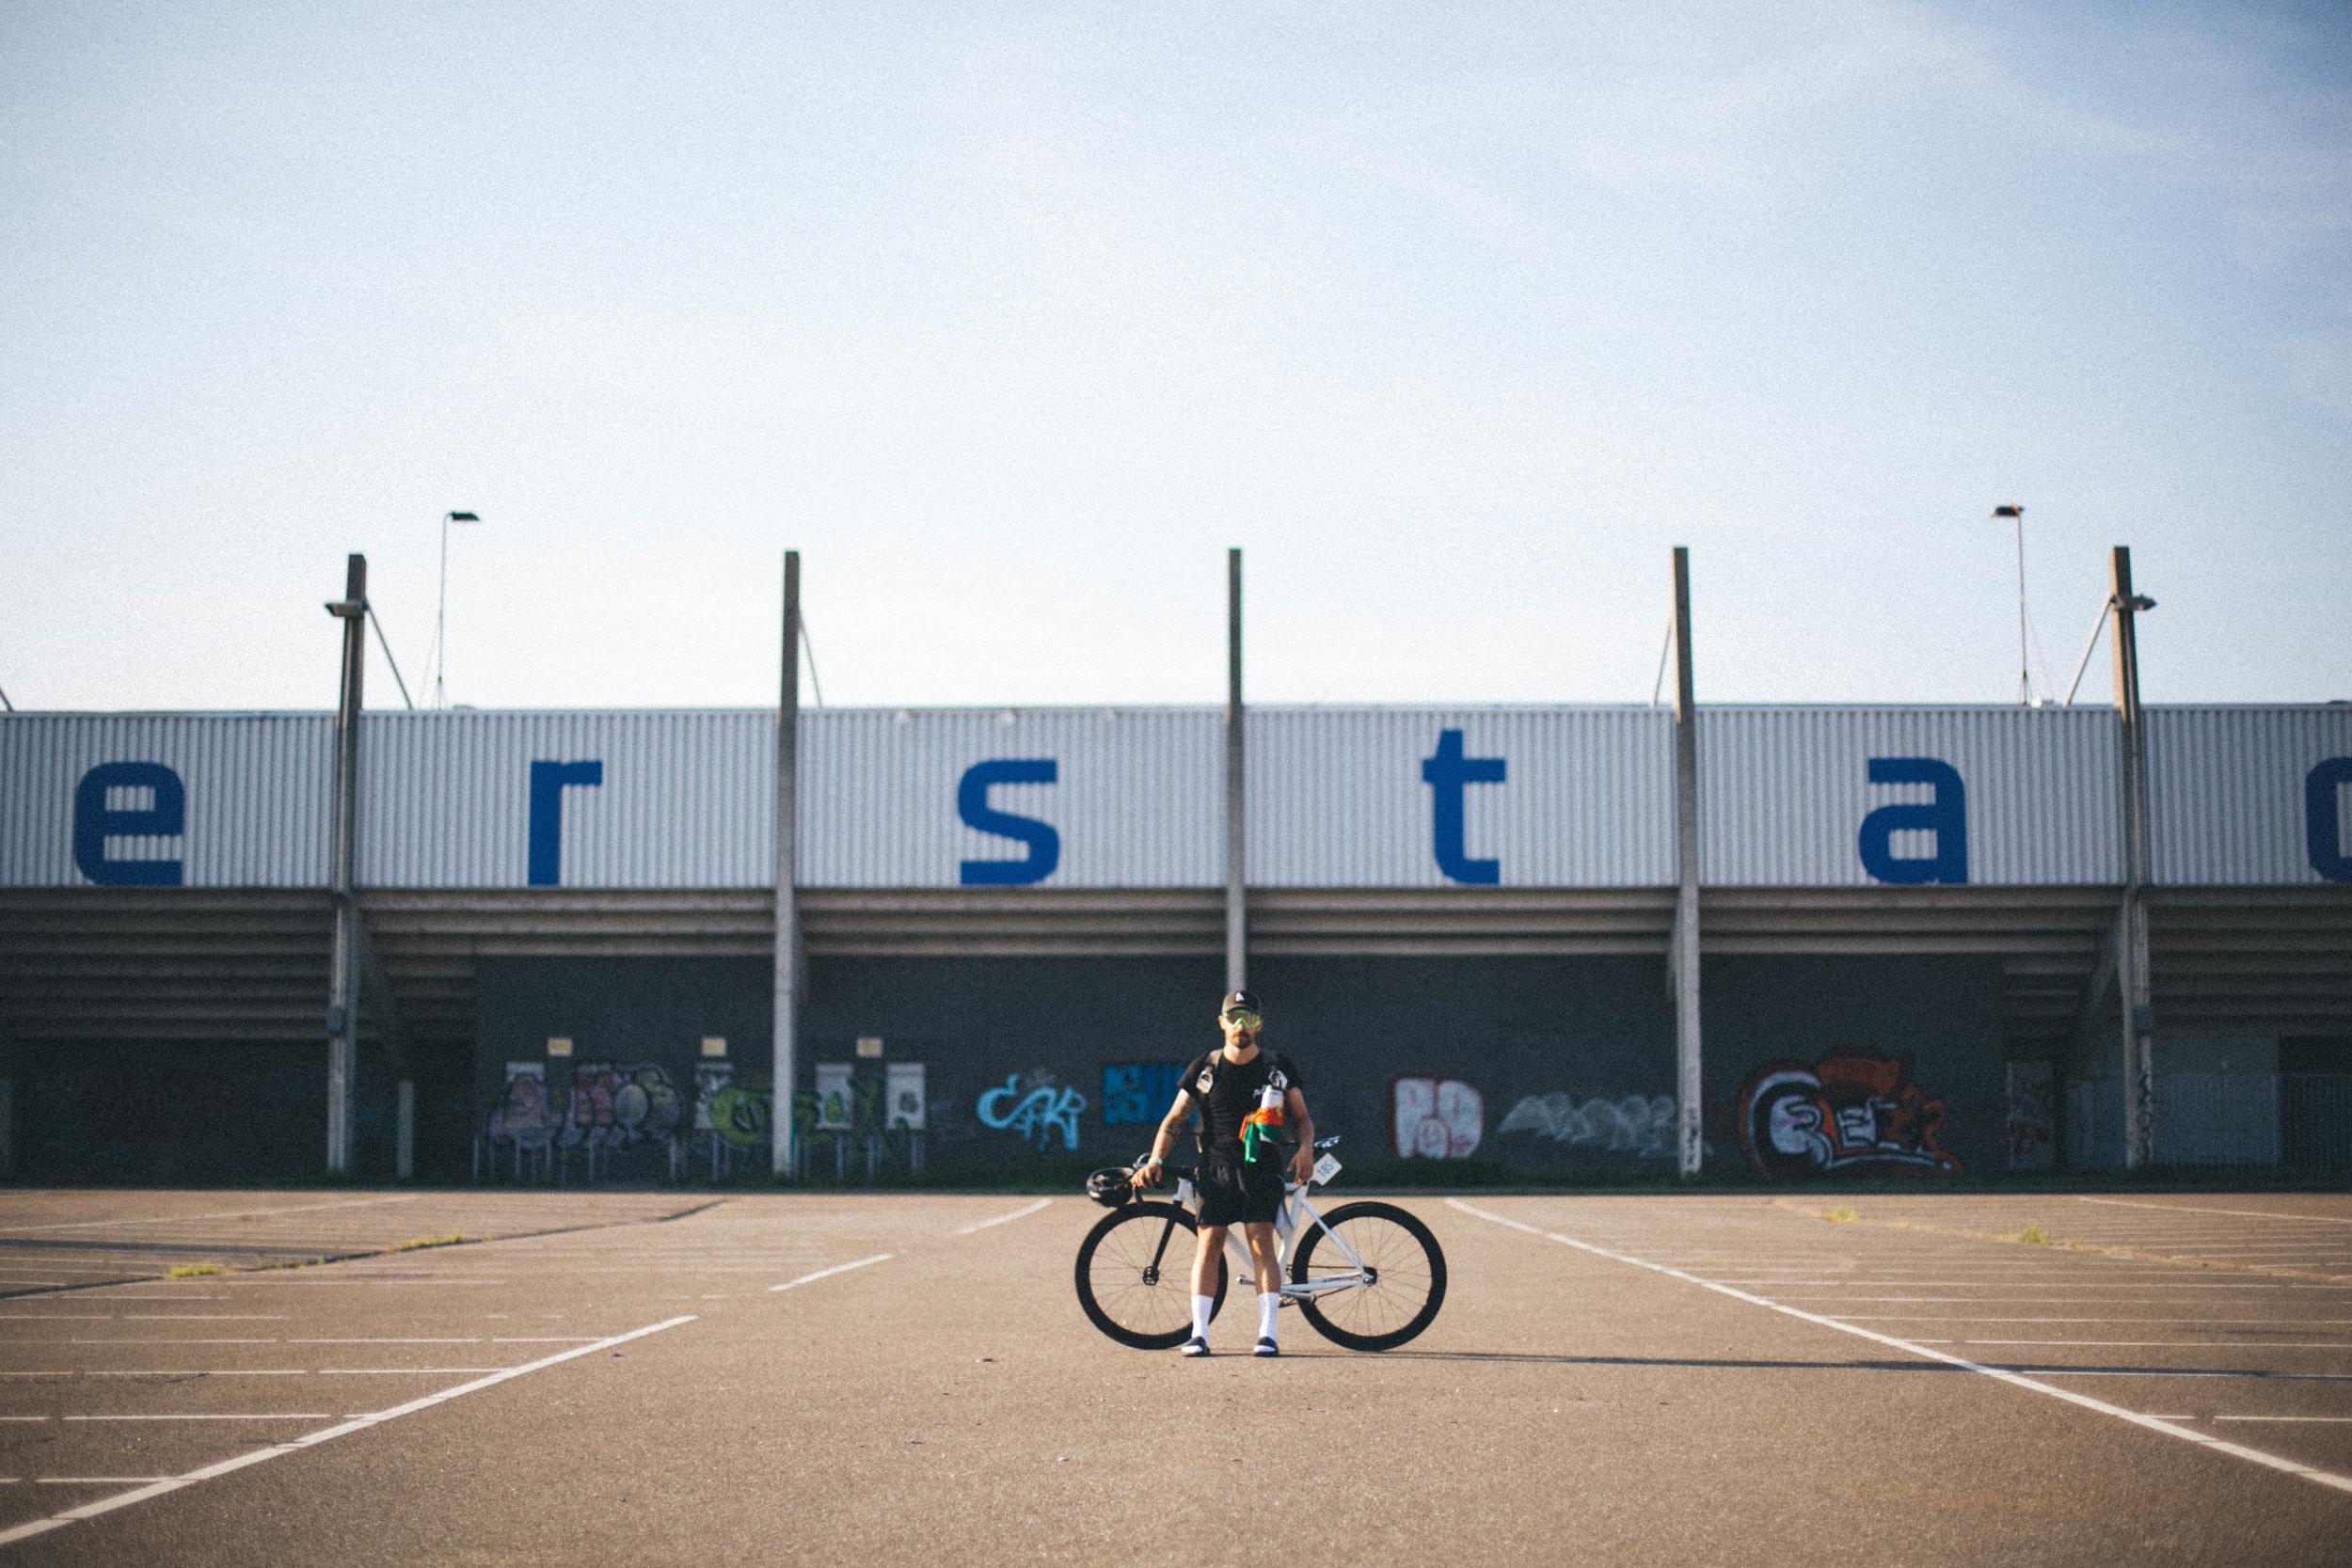 The stadium Roosendaal